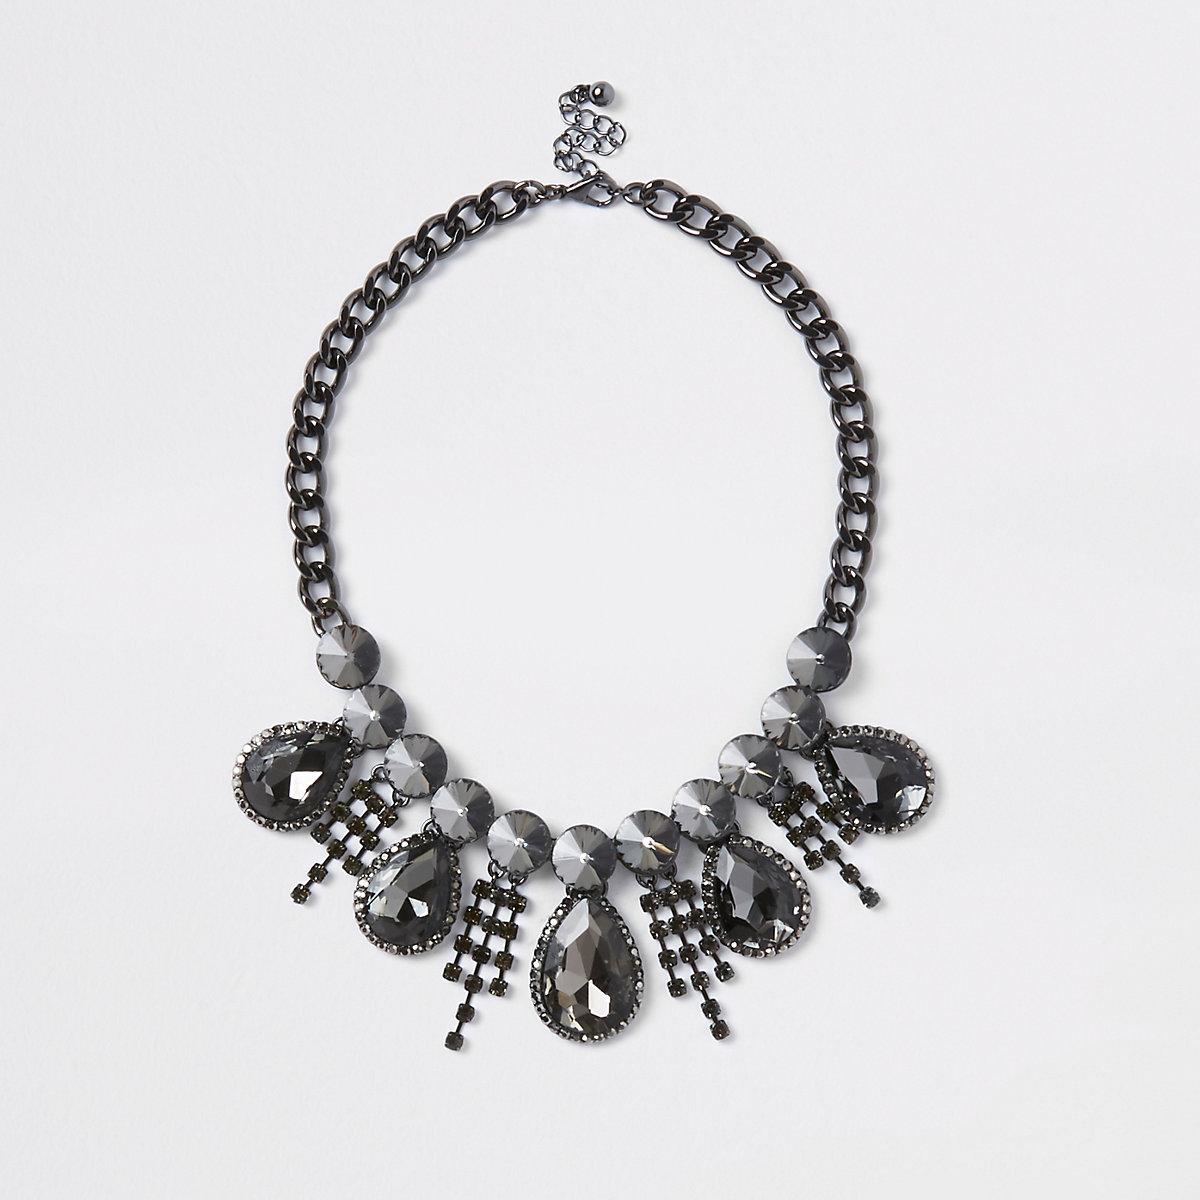 Black rhinestone teardrop necklace